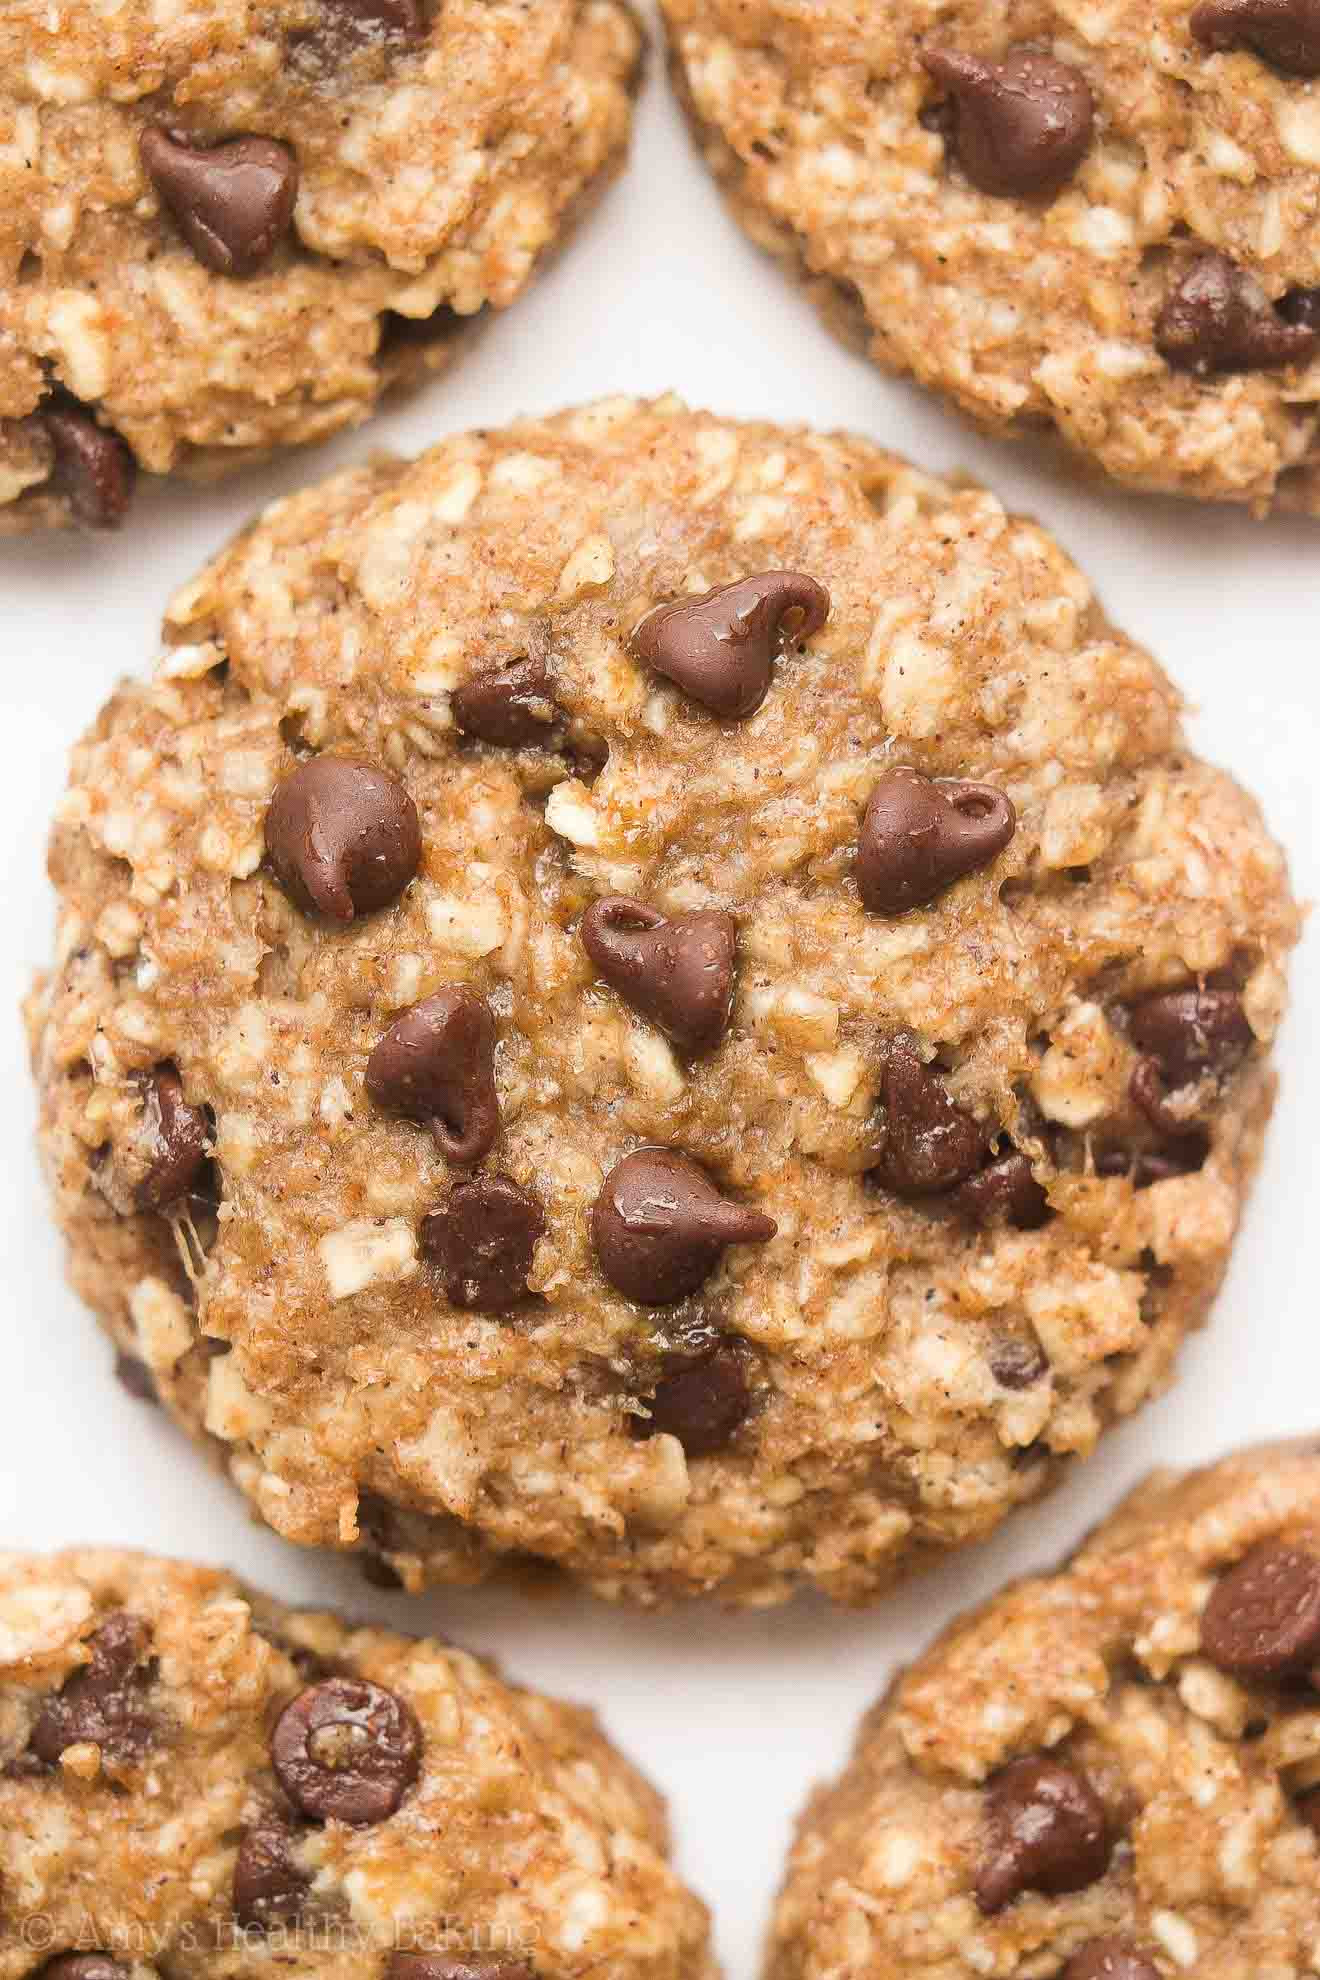 Breakfast Cookies Healthy  Healthy Chocolate Chip Banana Oatmeal Breakfast Cookies